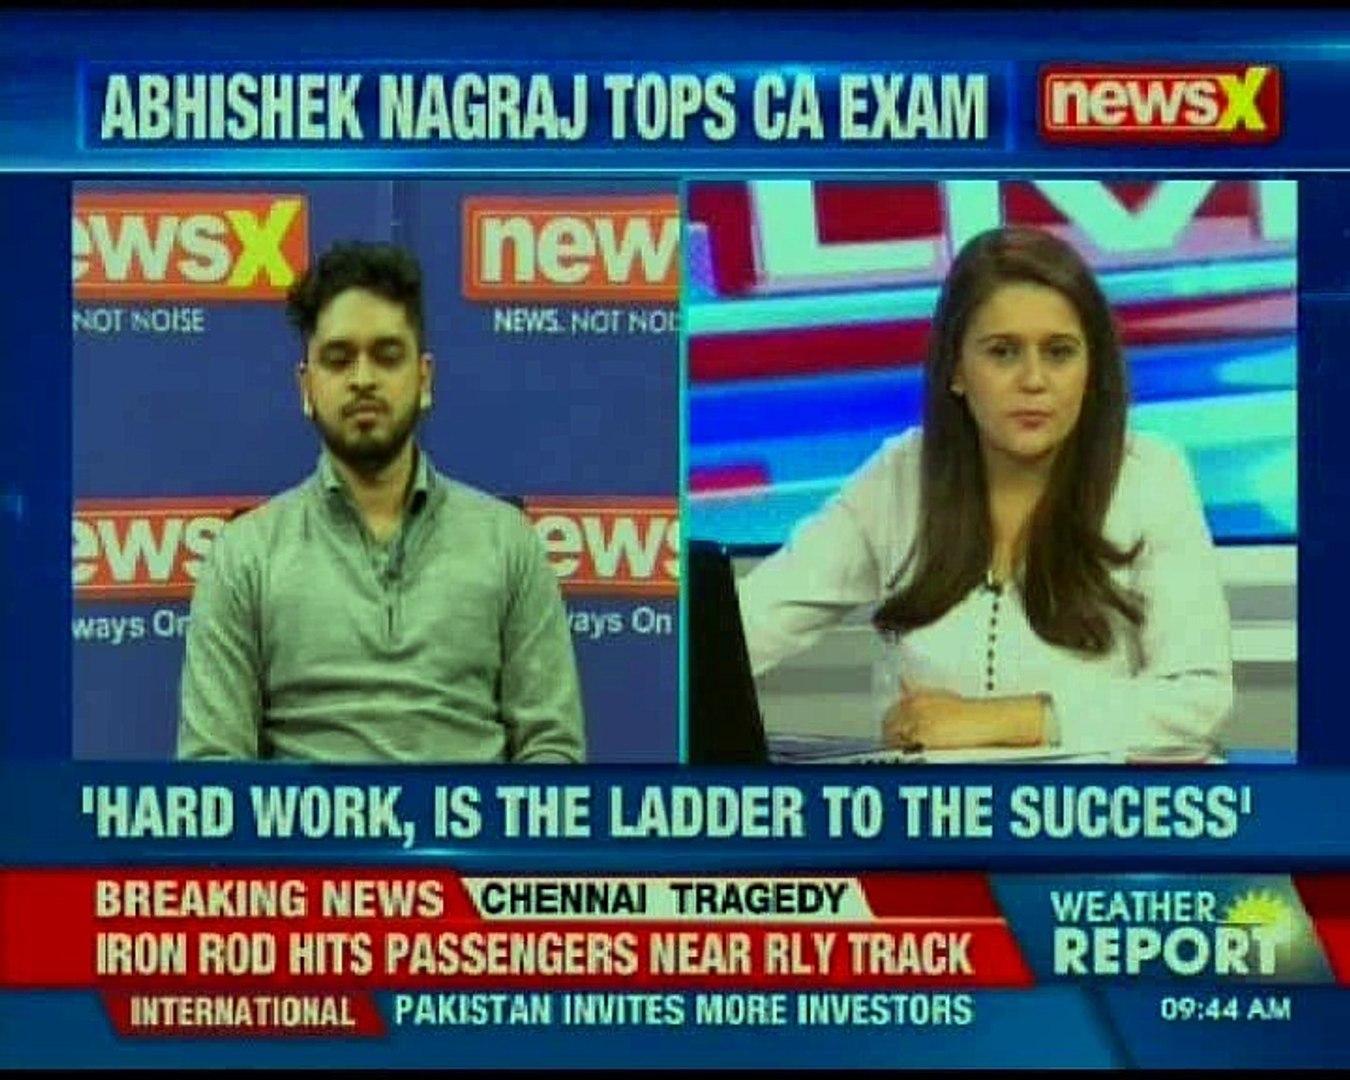 Abhishek Nagraj tops CA exam, secured 539 marks